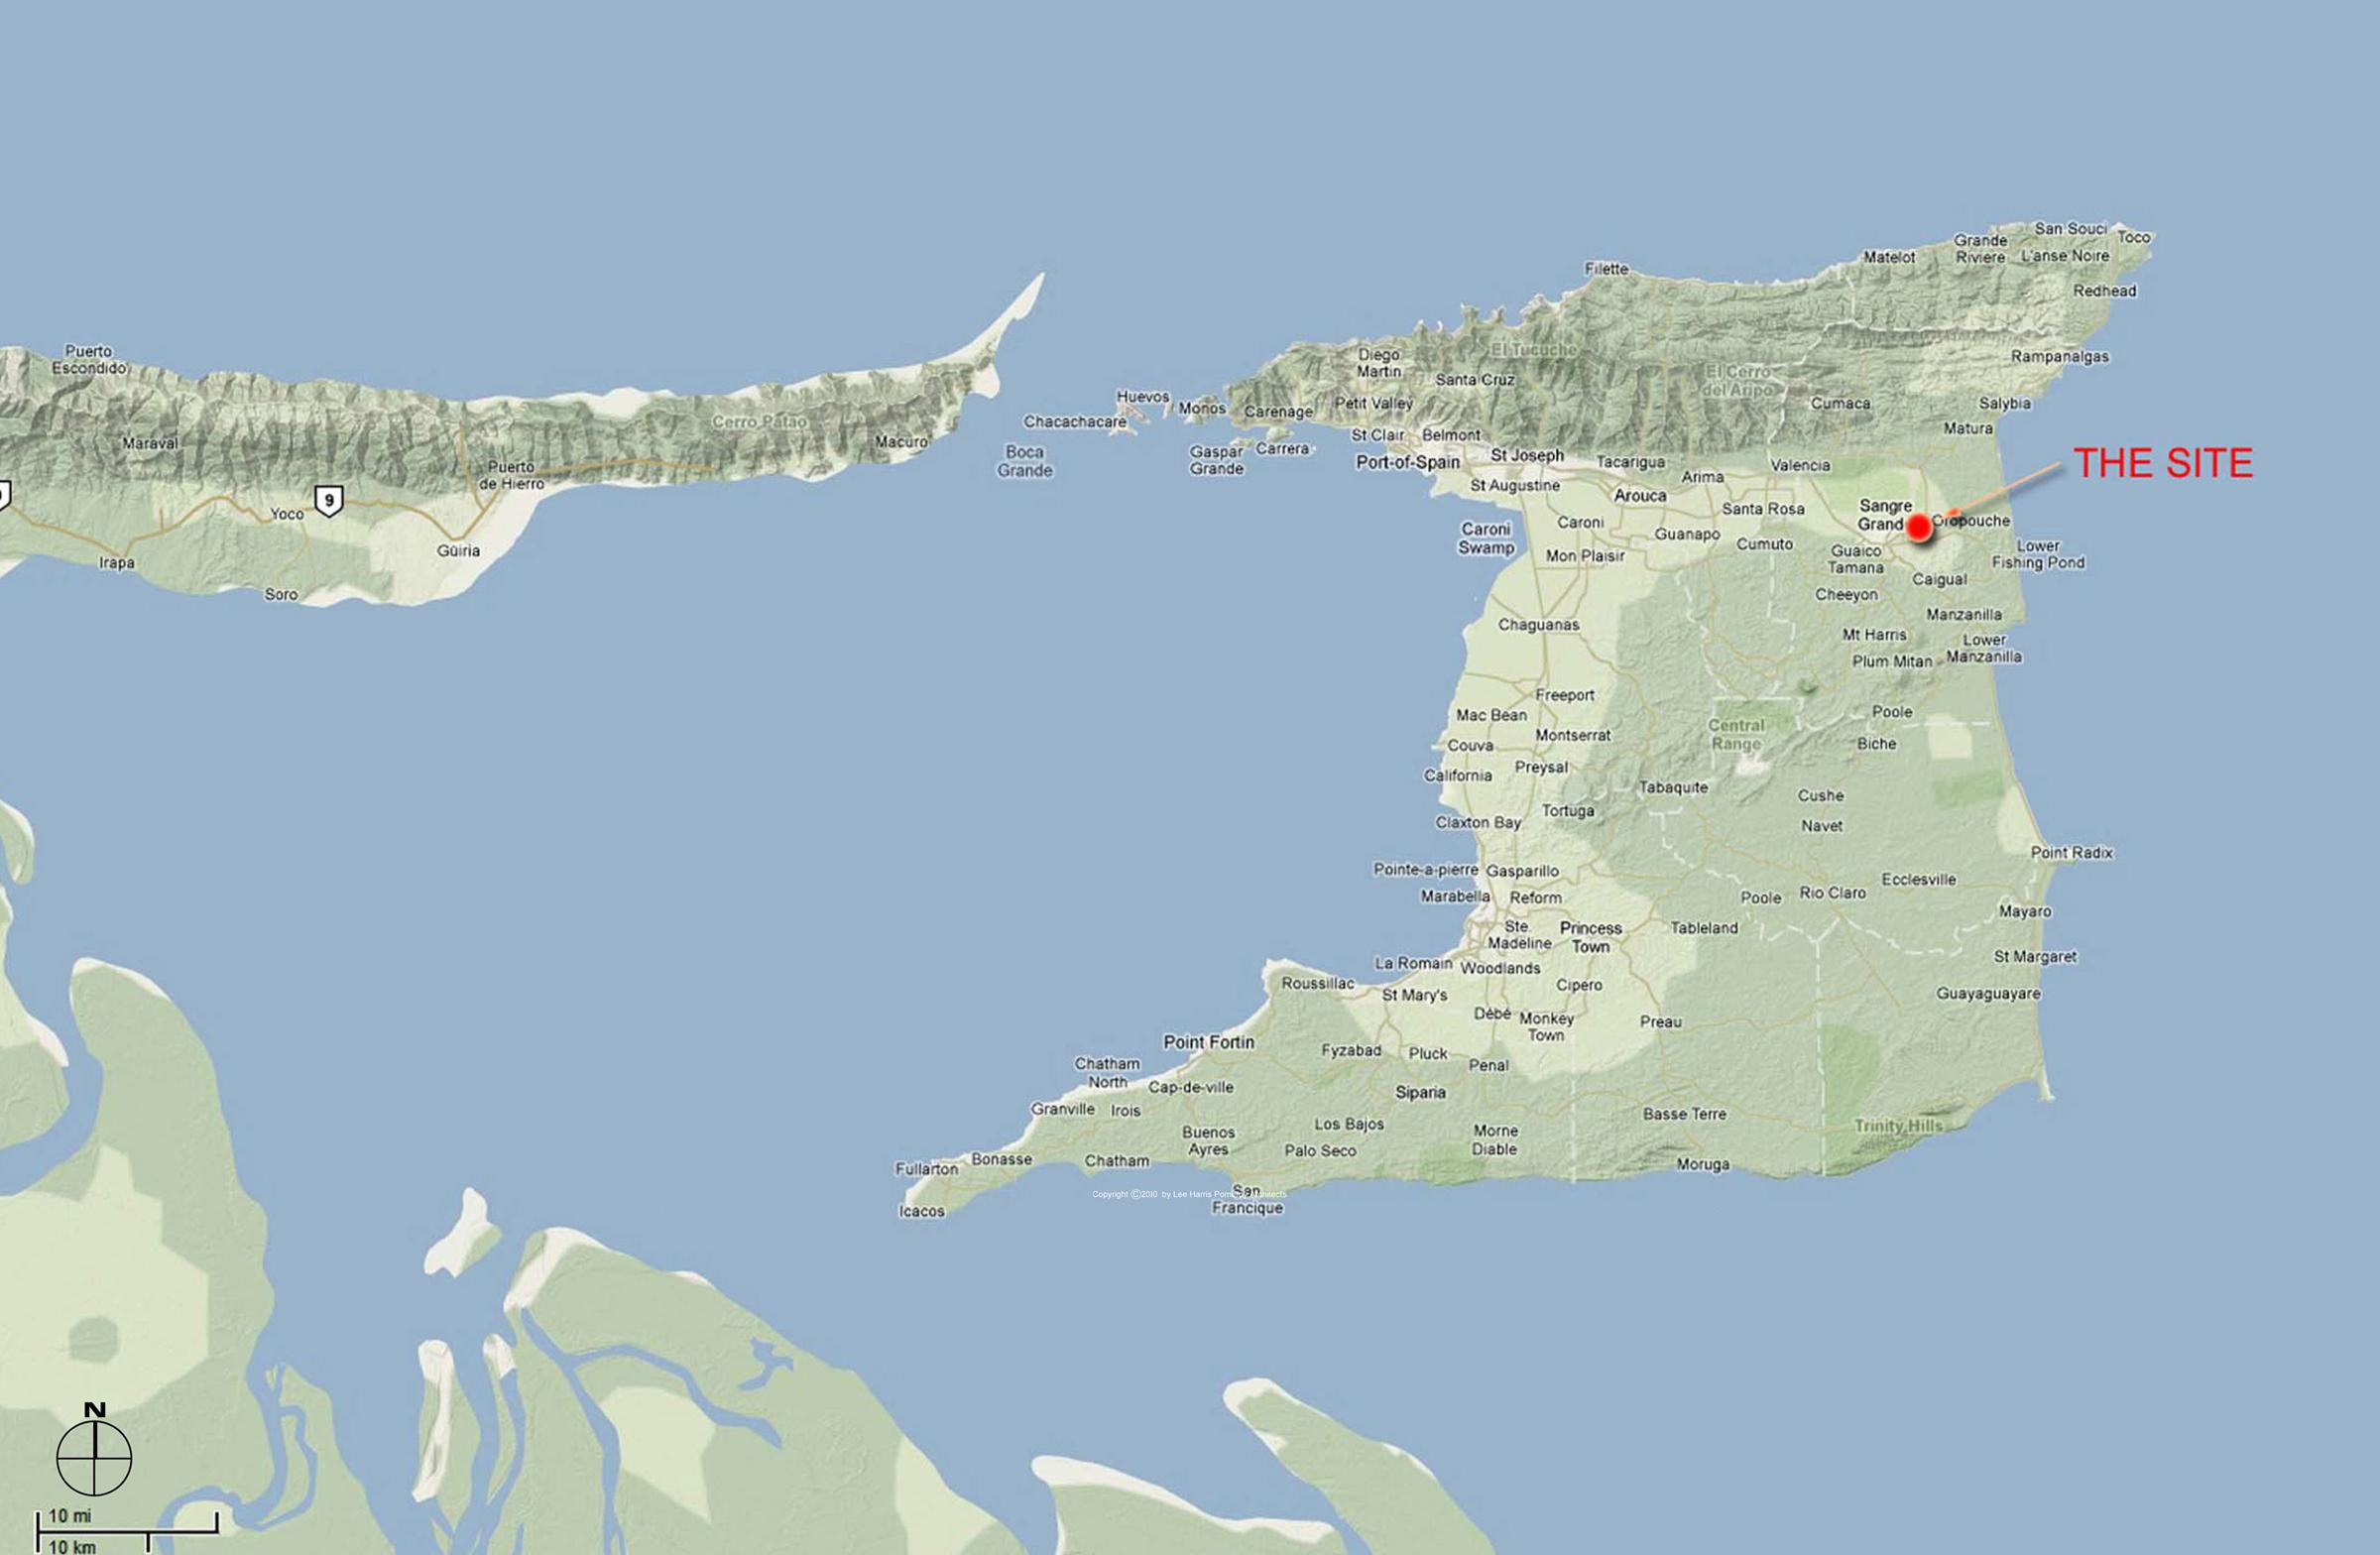 20903.00 - A3 Vision Layout 02 PLAN Vicinity Map.jpg